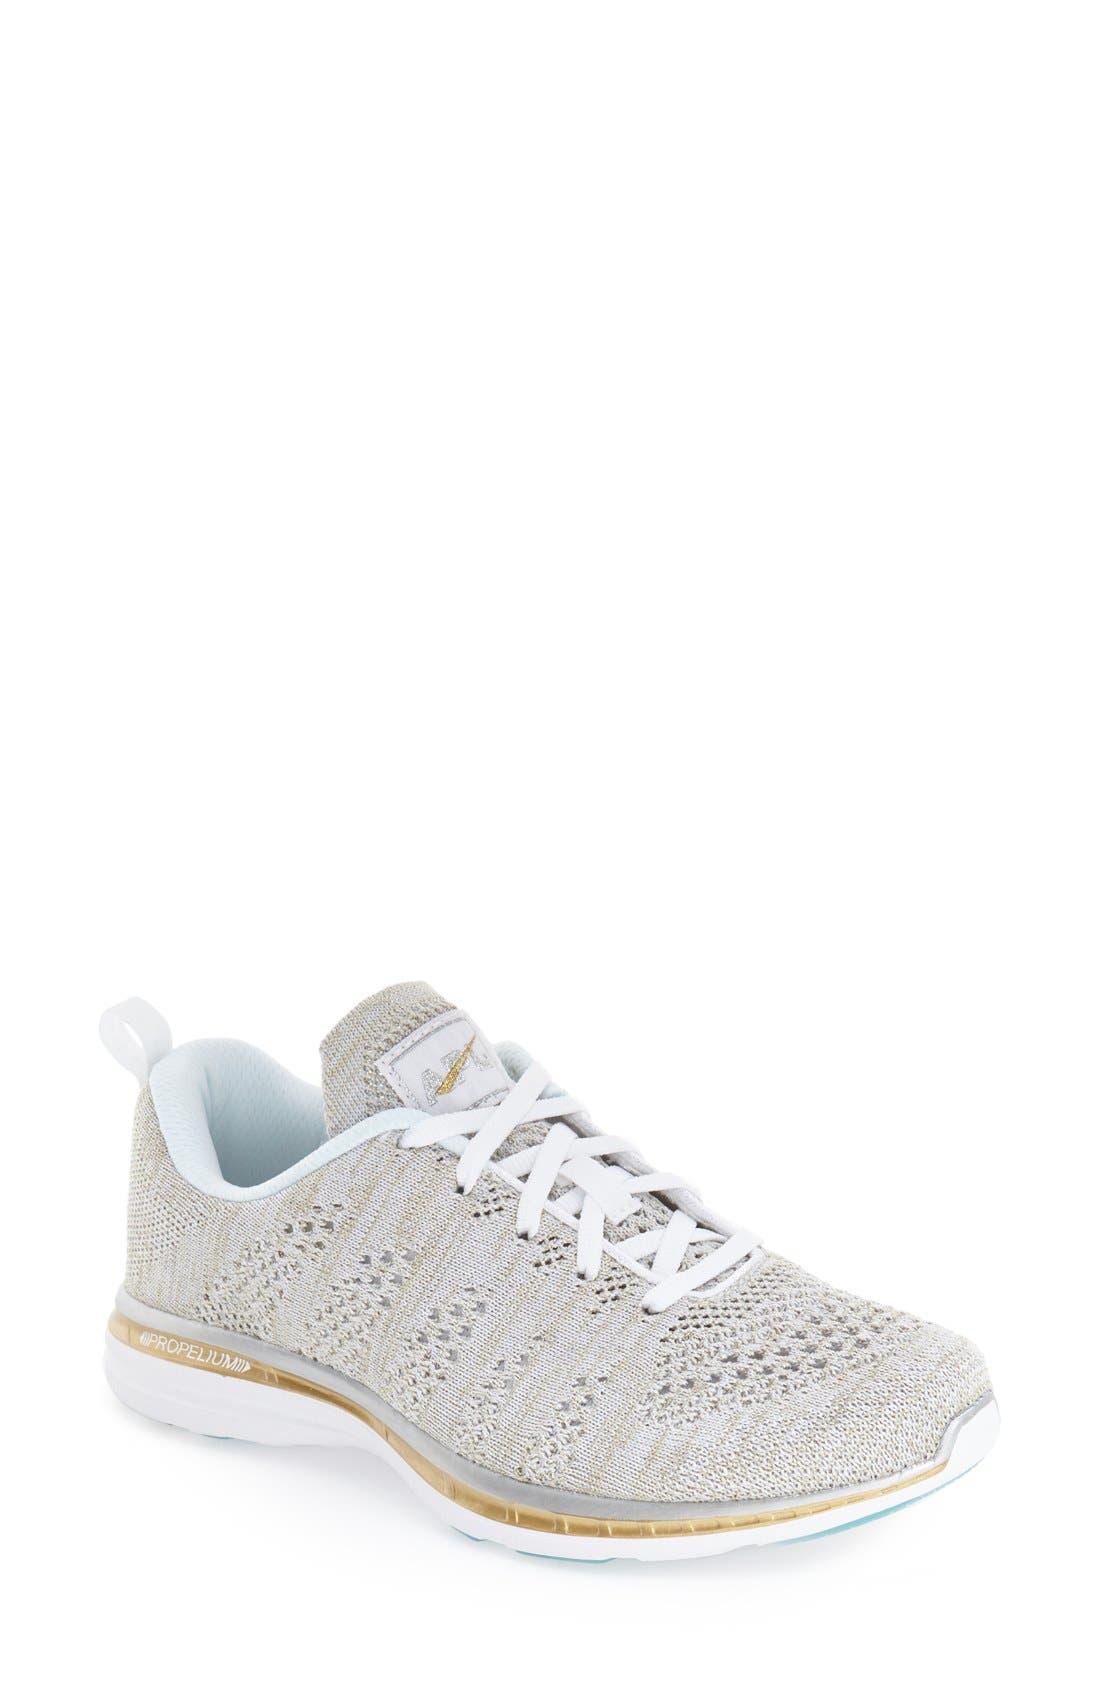 Main Image - APL 'Techloom Pro' Running Shoe (Women)